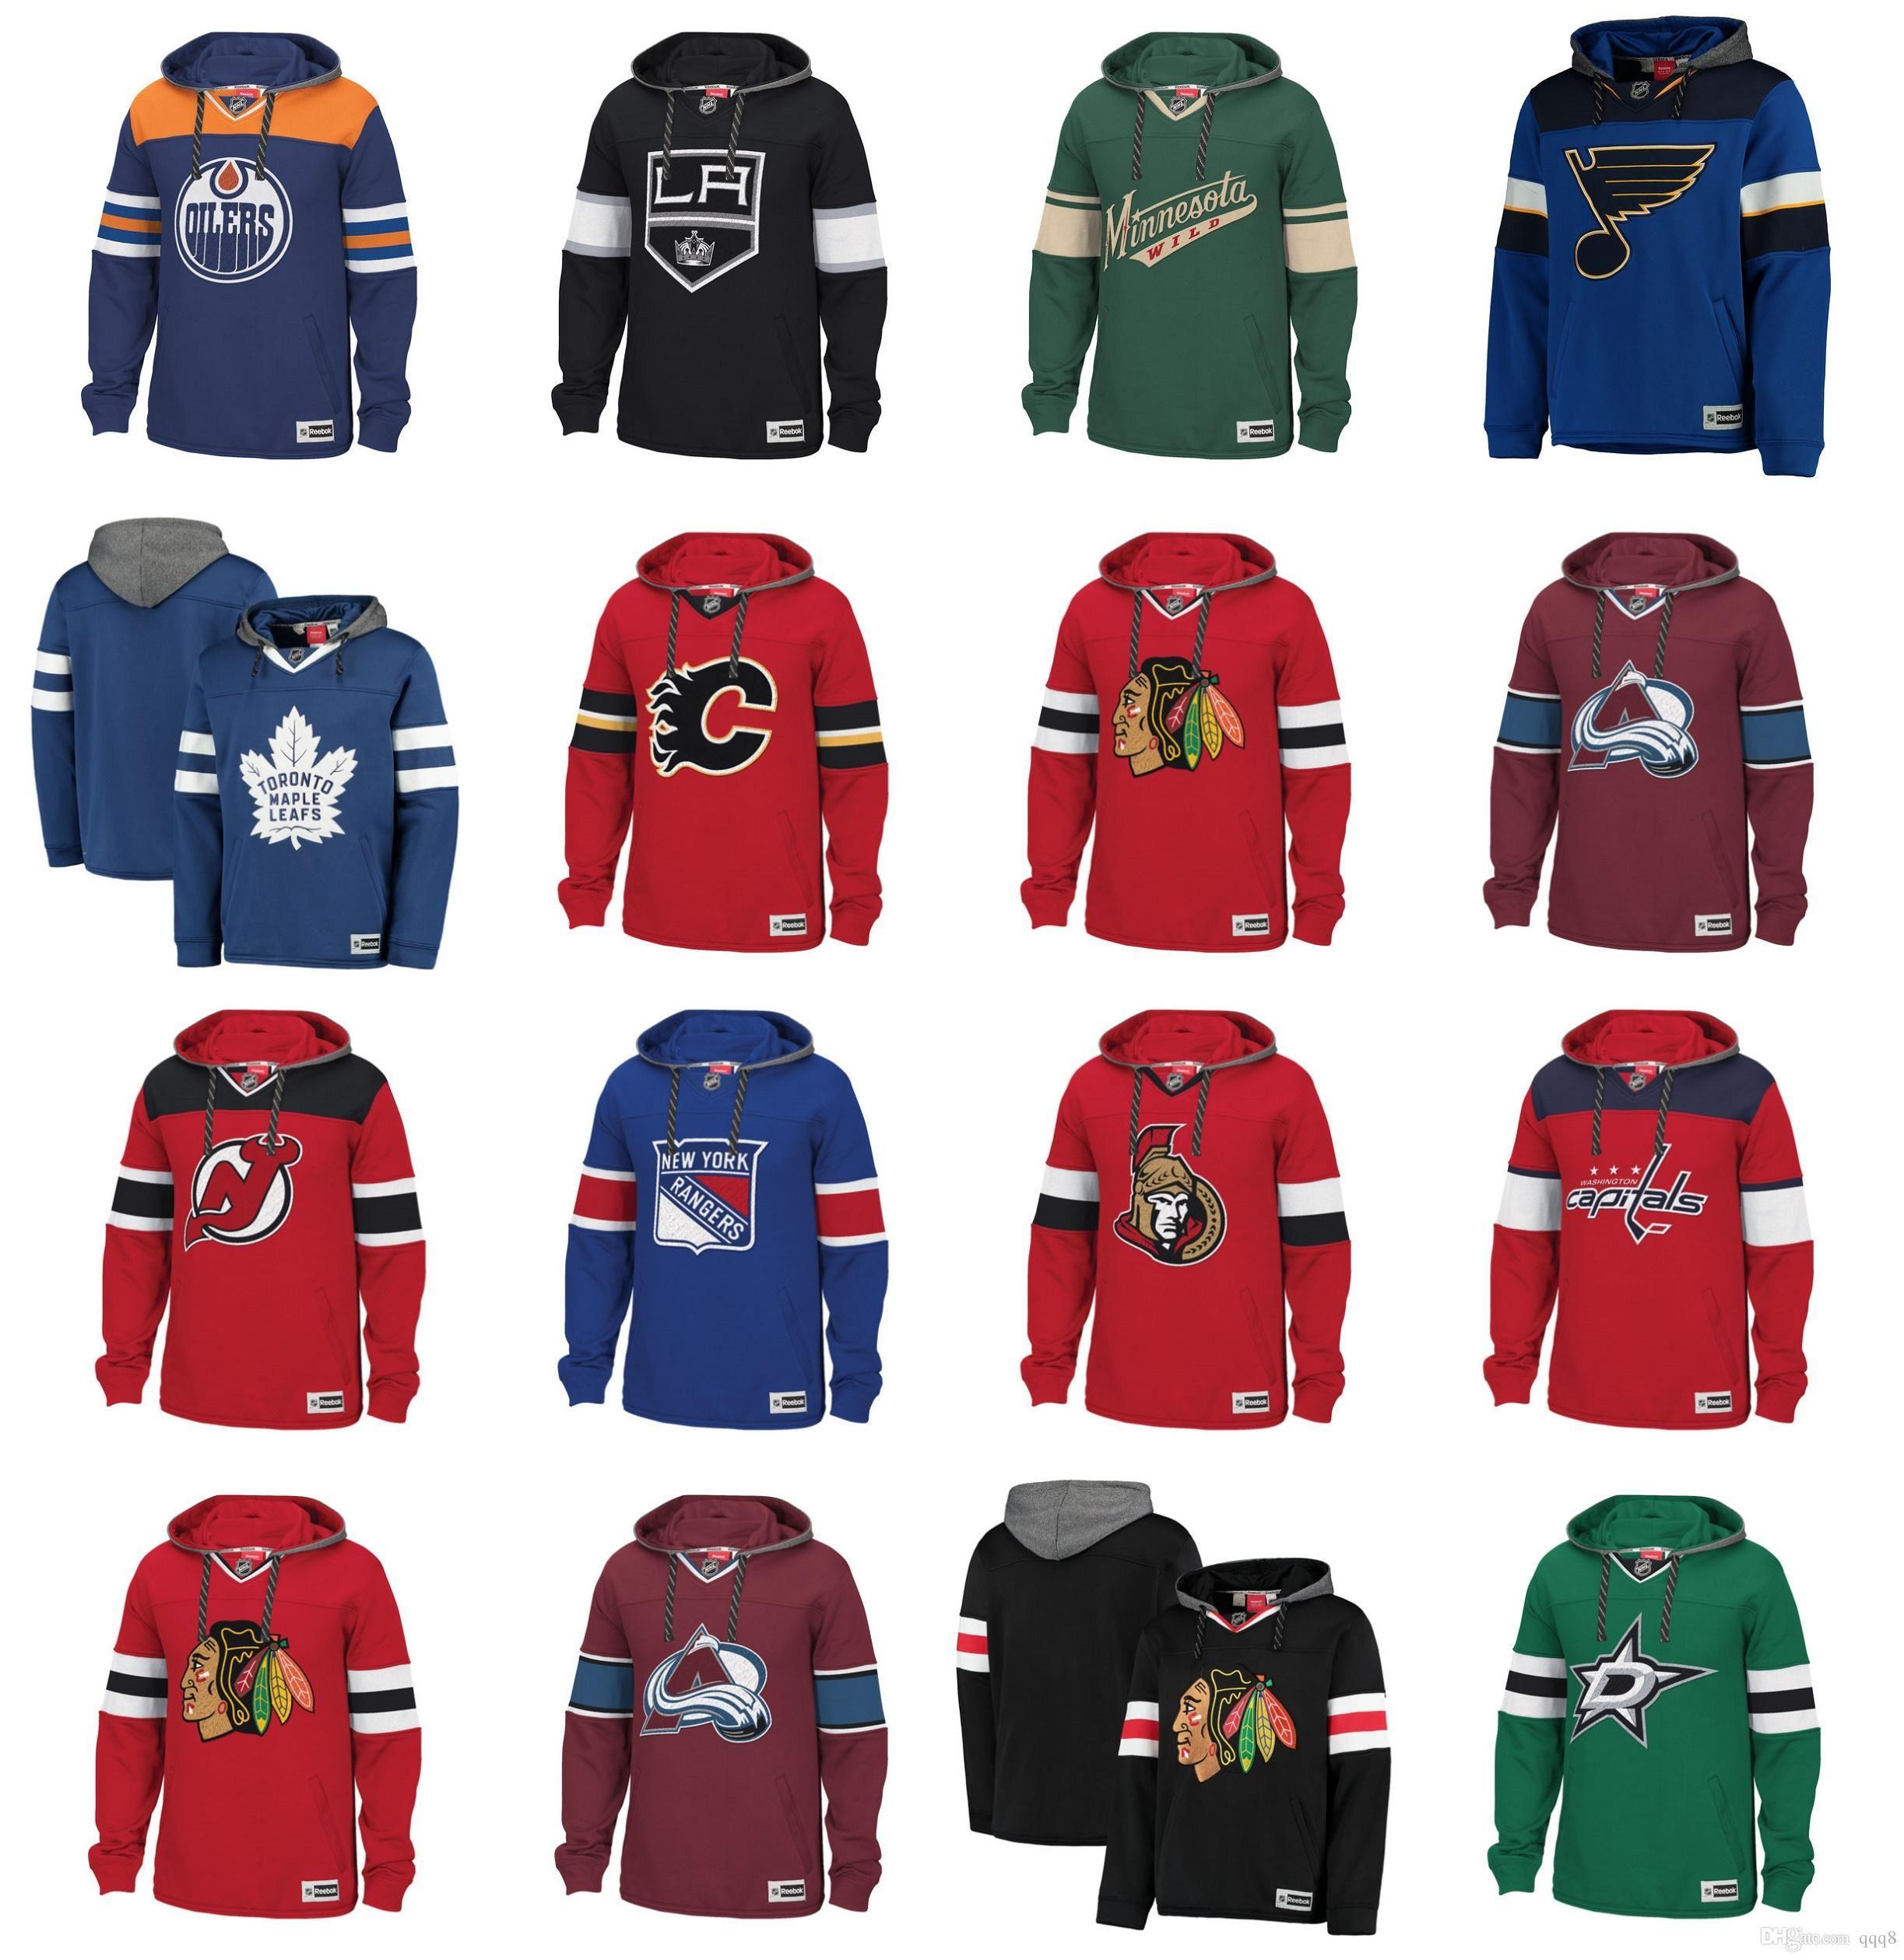 5bf89feb Sudadera con capucha de hockey NHL personalizada Chicago Blackhawks  Vancouver Canucks St. Louis Blues Tampa Bay Relámpago New York Rangers  Boston ...